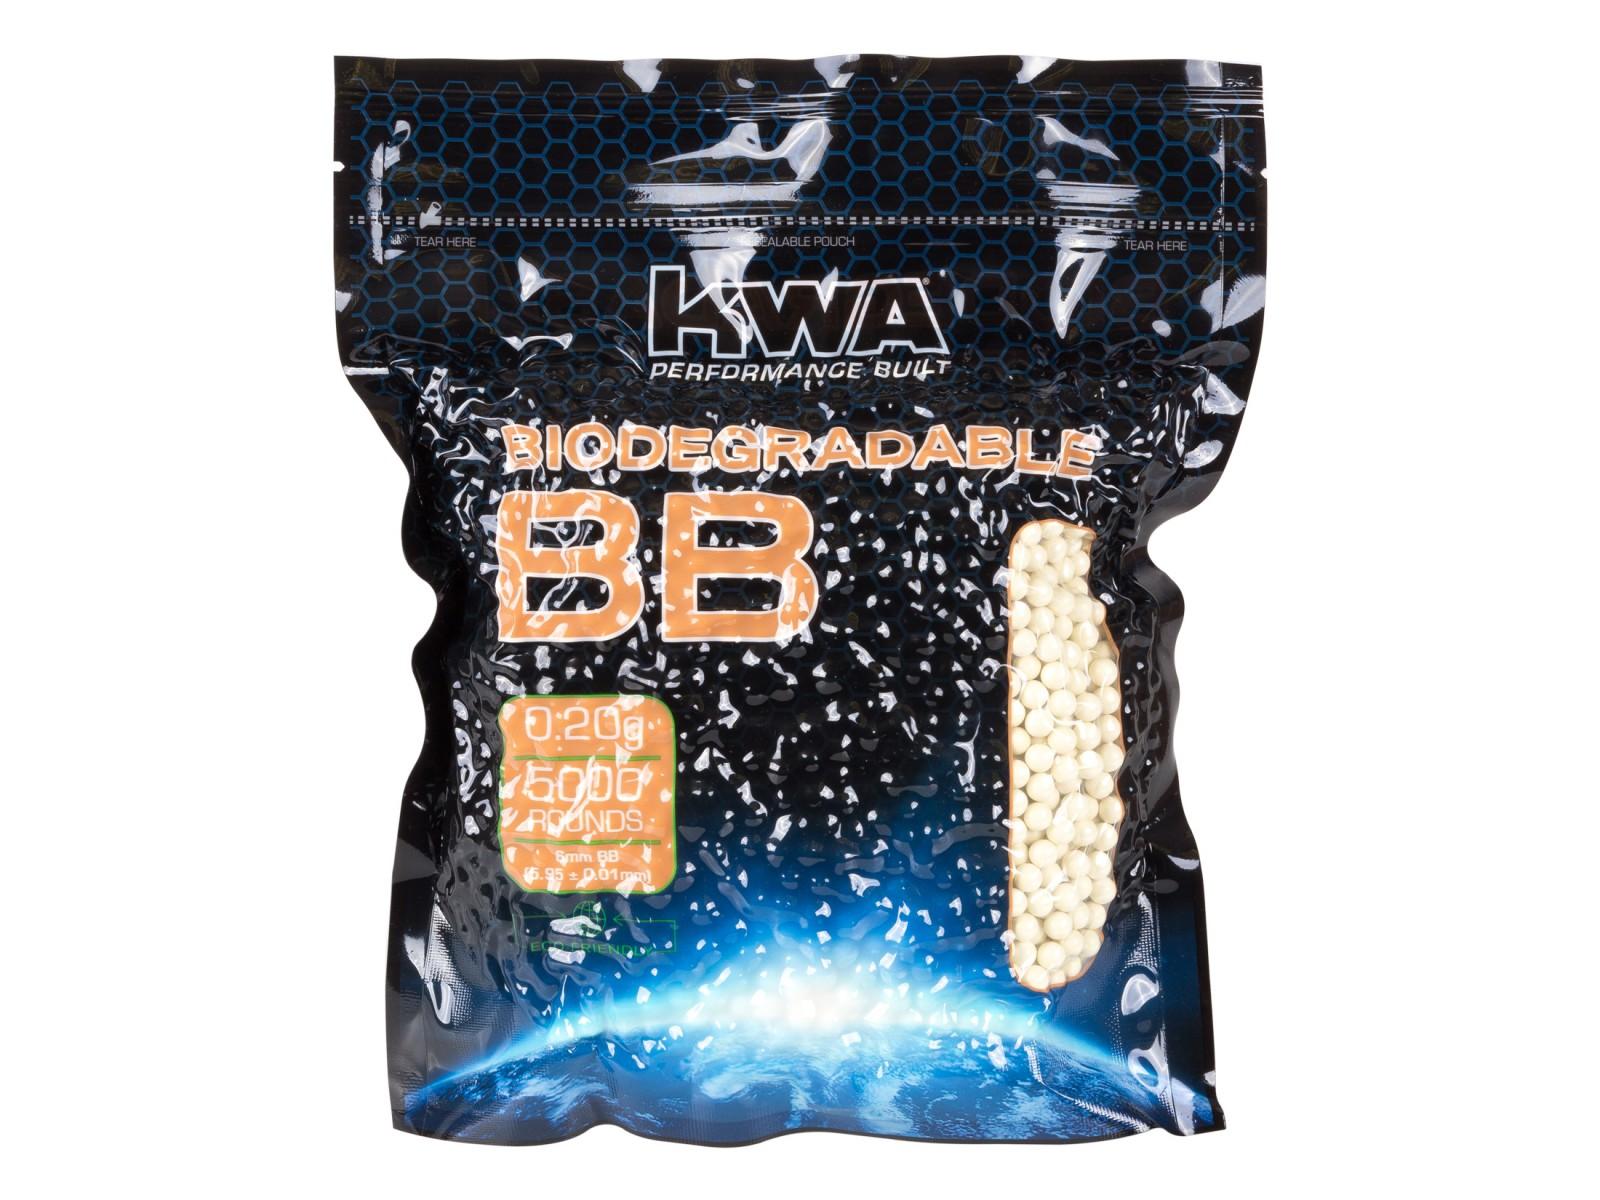 KWA Biodegradable Airsoft BBs, 0.20g, White, 5,000 Rds